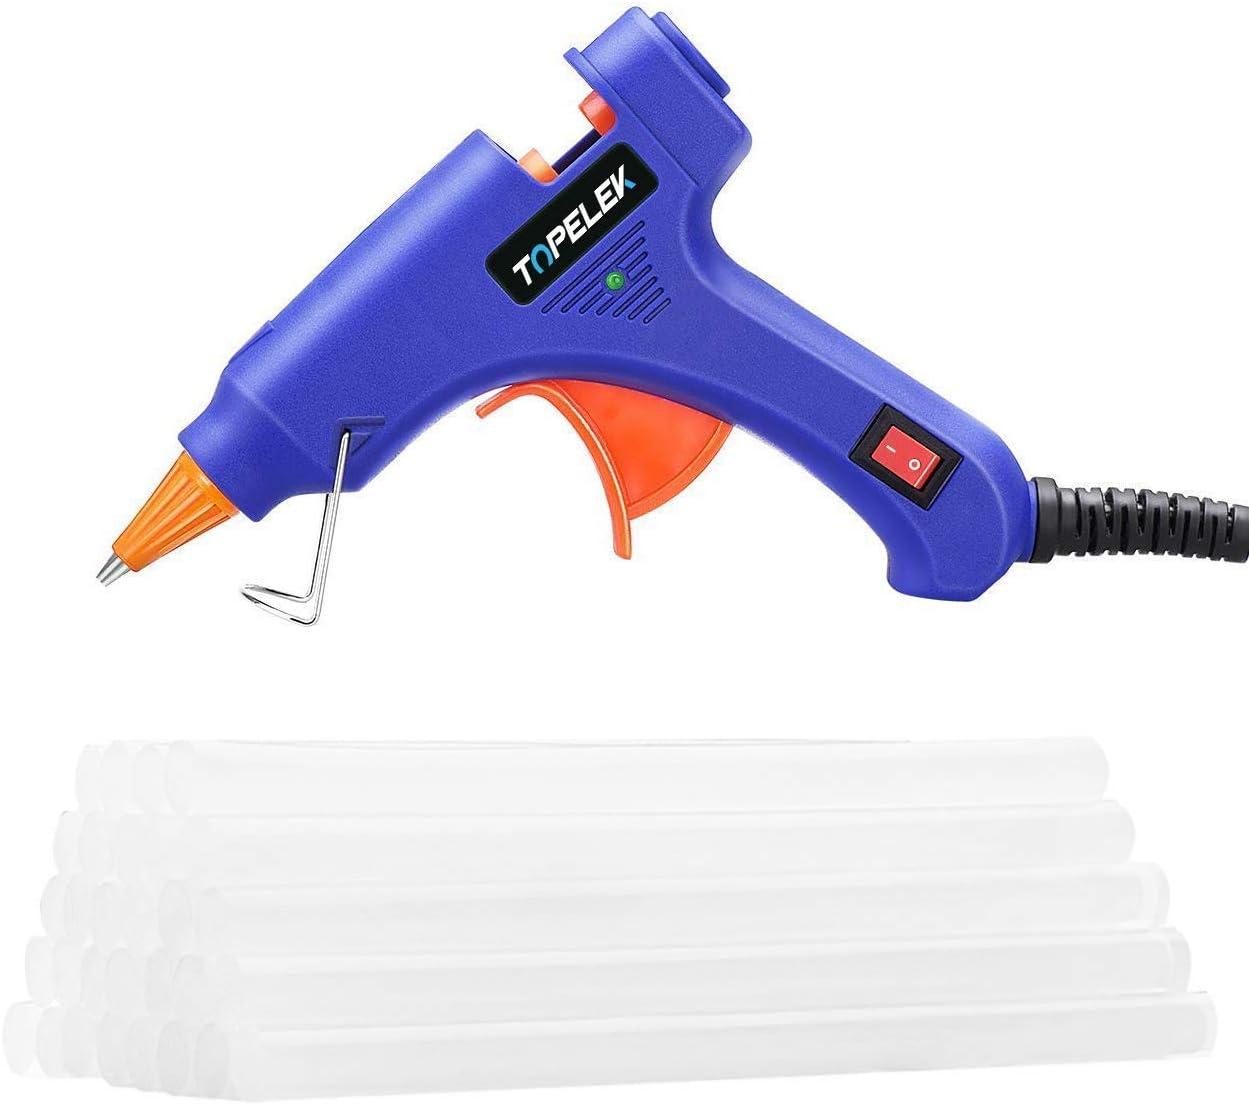 Hot Glue Gun, TOPELEK Mini Heating Hot Melt Glue Gun with 30pcs Melt Glue Sticks, Melting Glue Gun Set for School DIY Arts and Crafts Projects, Home Quick Repairs(20 Watts, Blue)